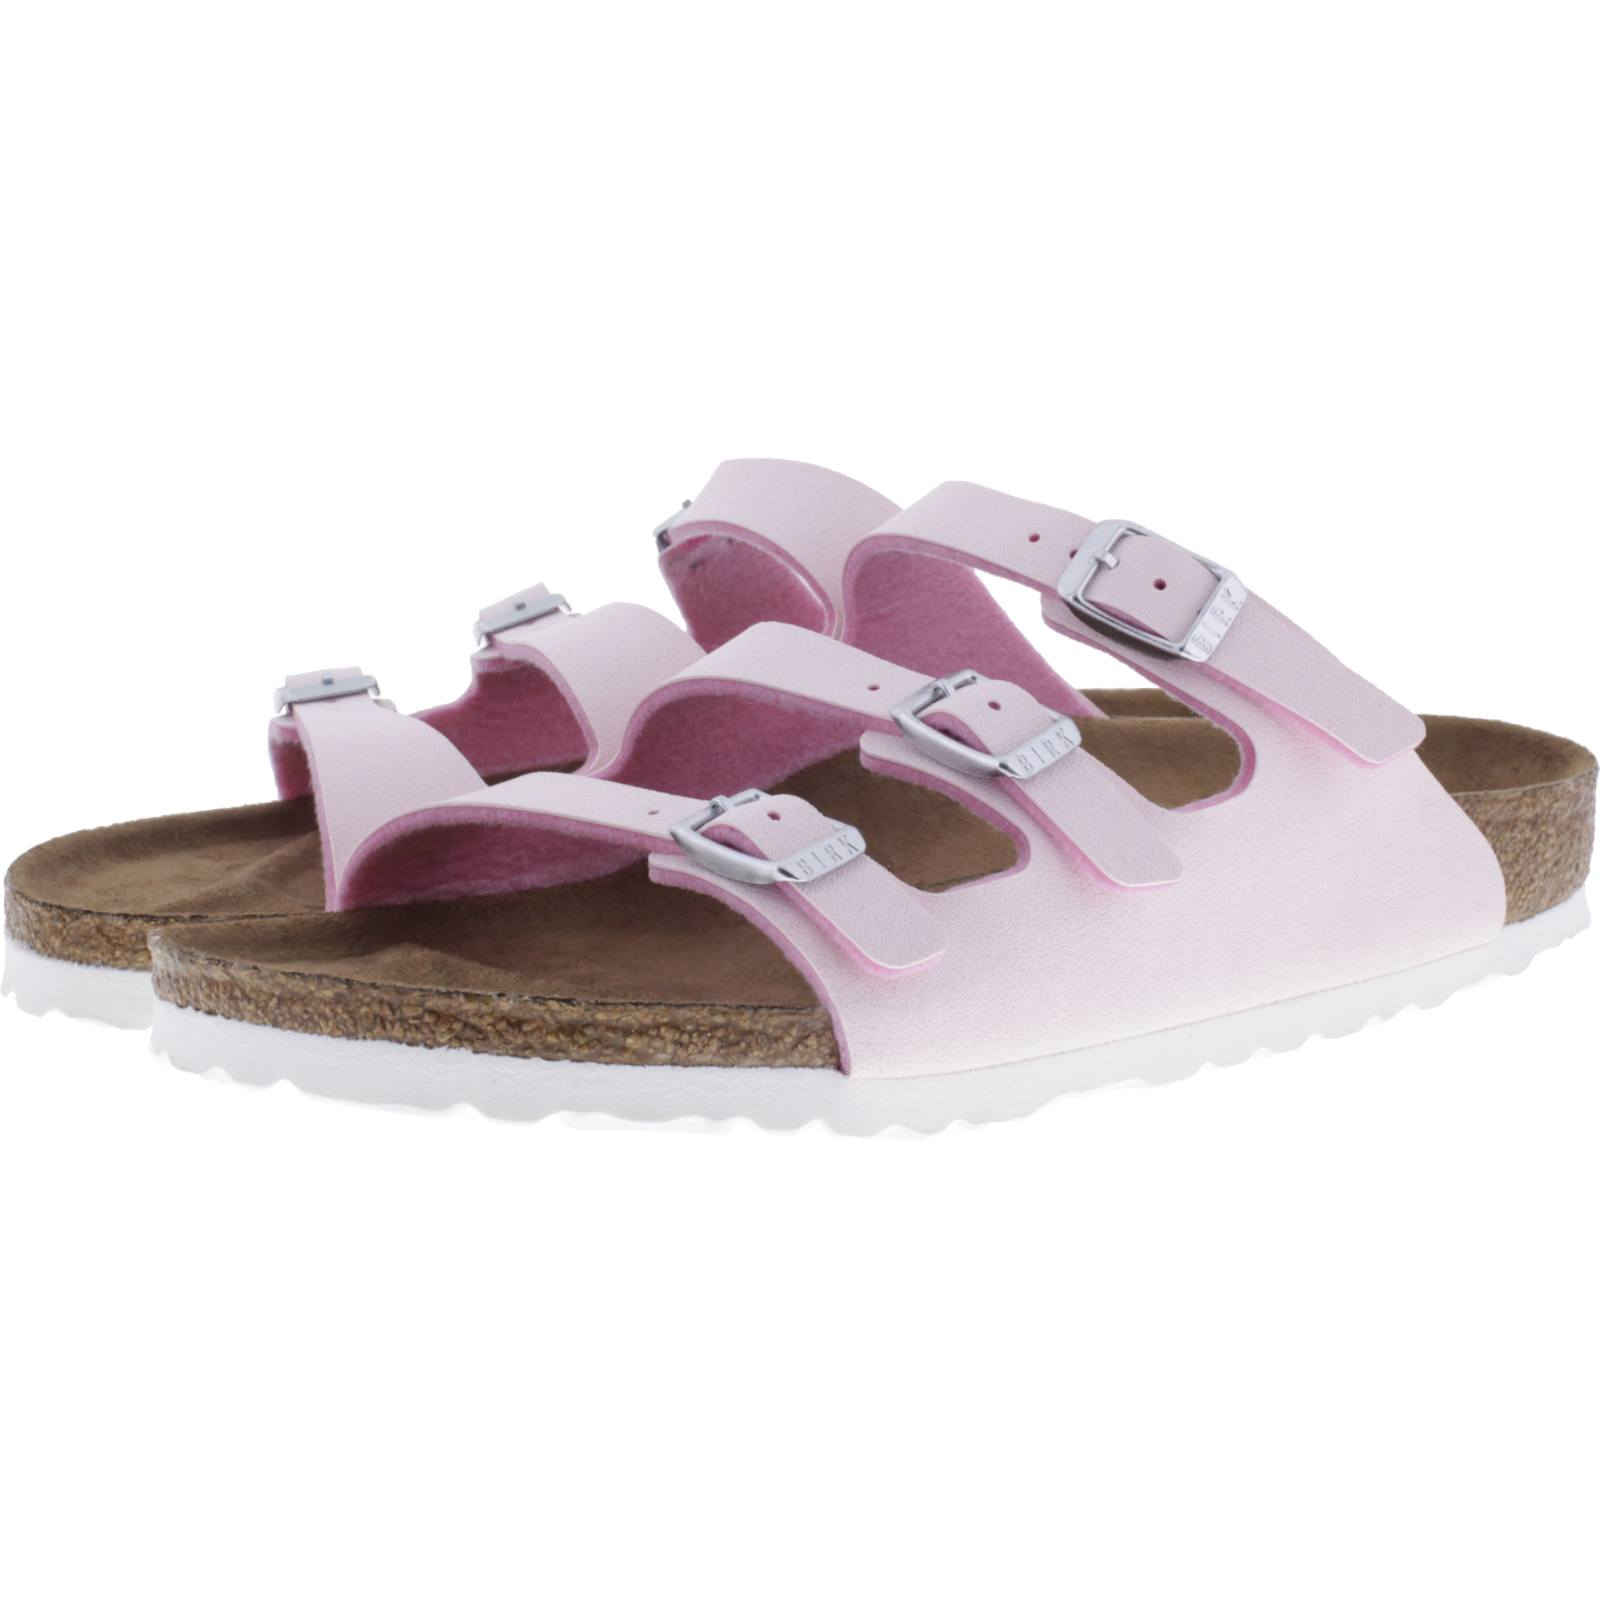 3d170d81326925 Birkenstock Online Shop - Birkenstock Schuhe günstig kaufen